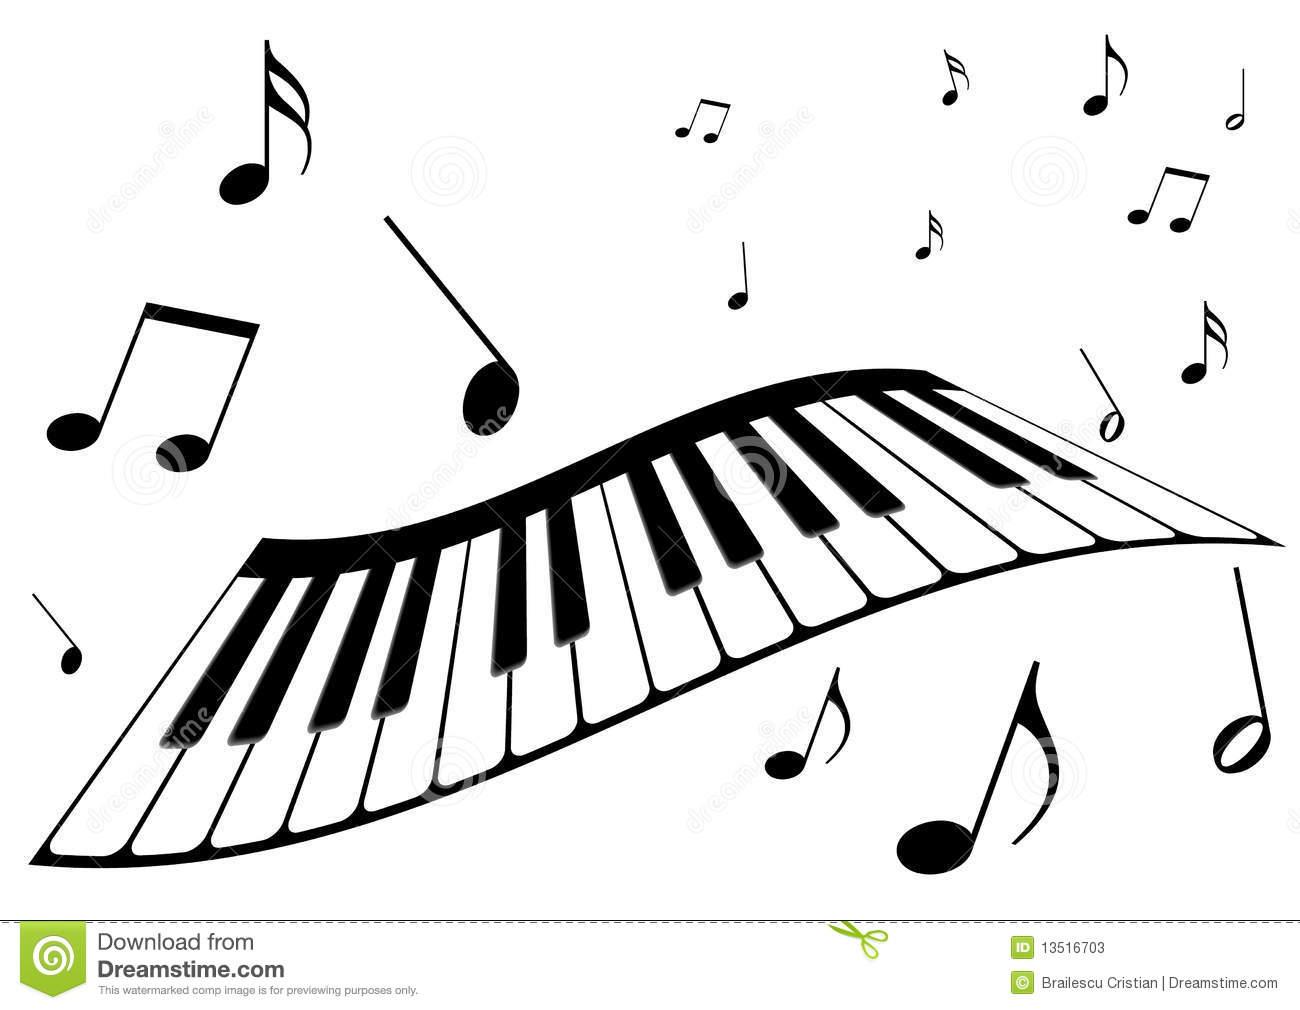 Piano Music Clipart 20 Free Cliparts